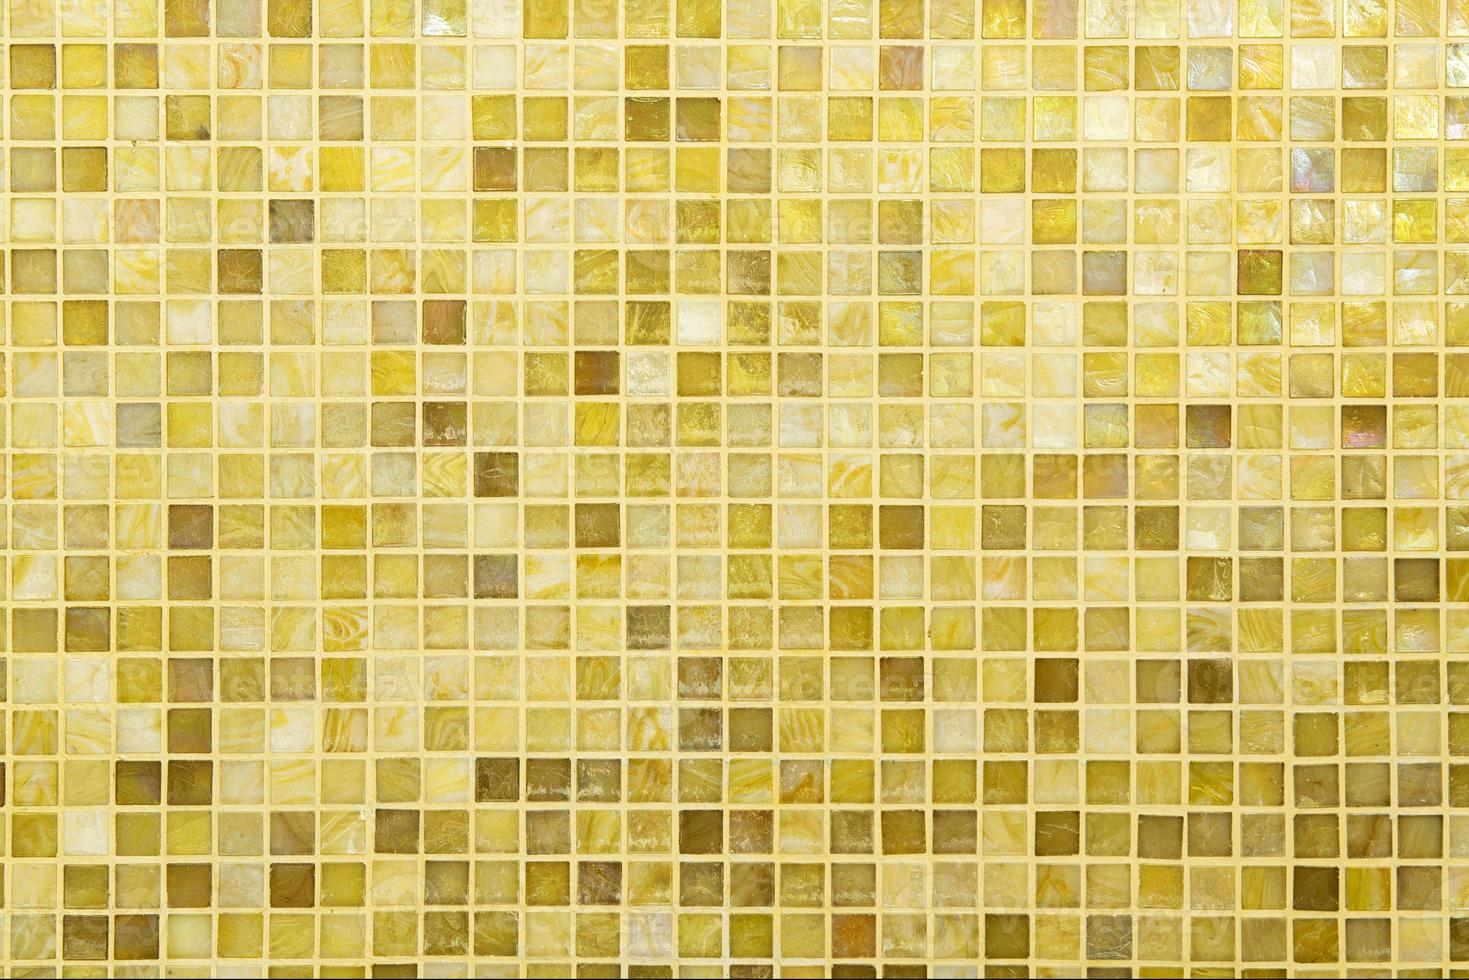 Mosaikfliese foto